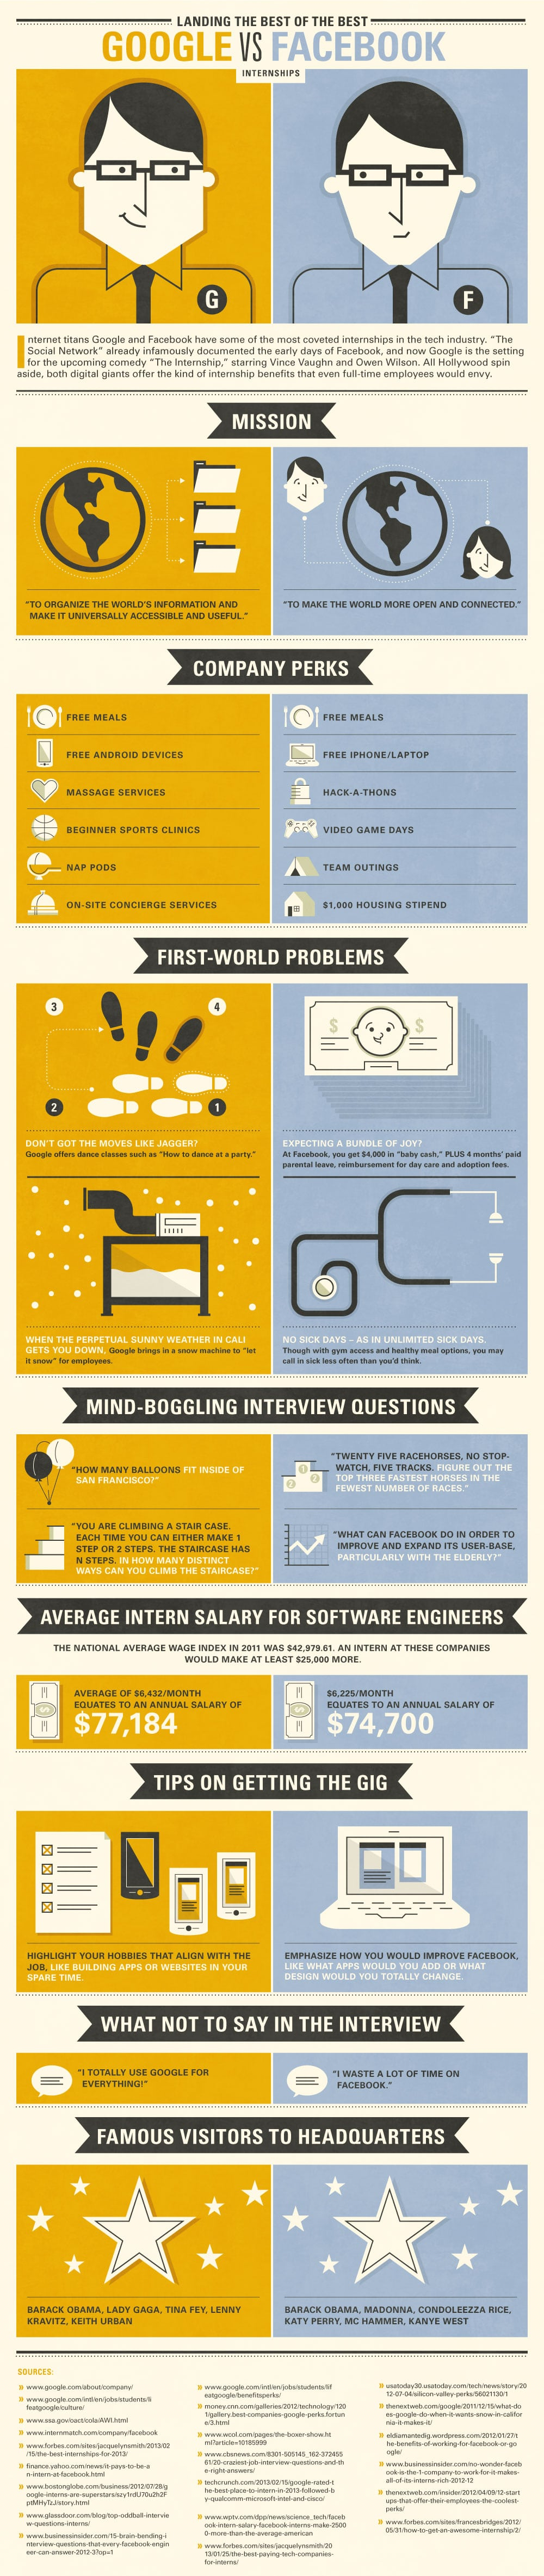 google-vs-facebook-internships-infographic